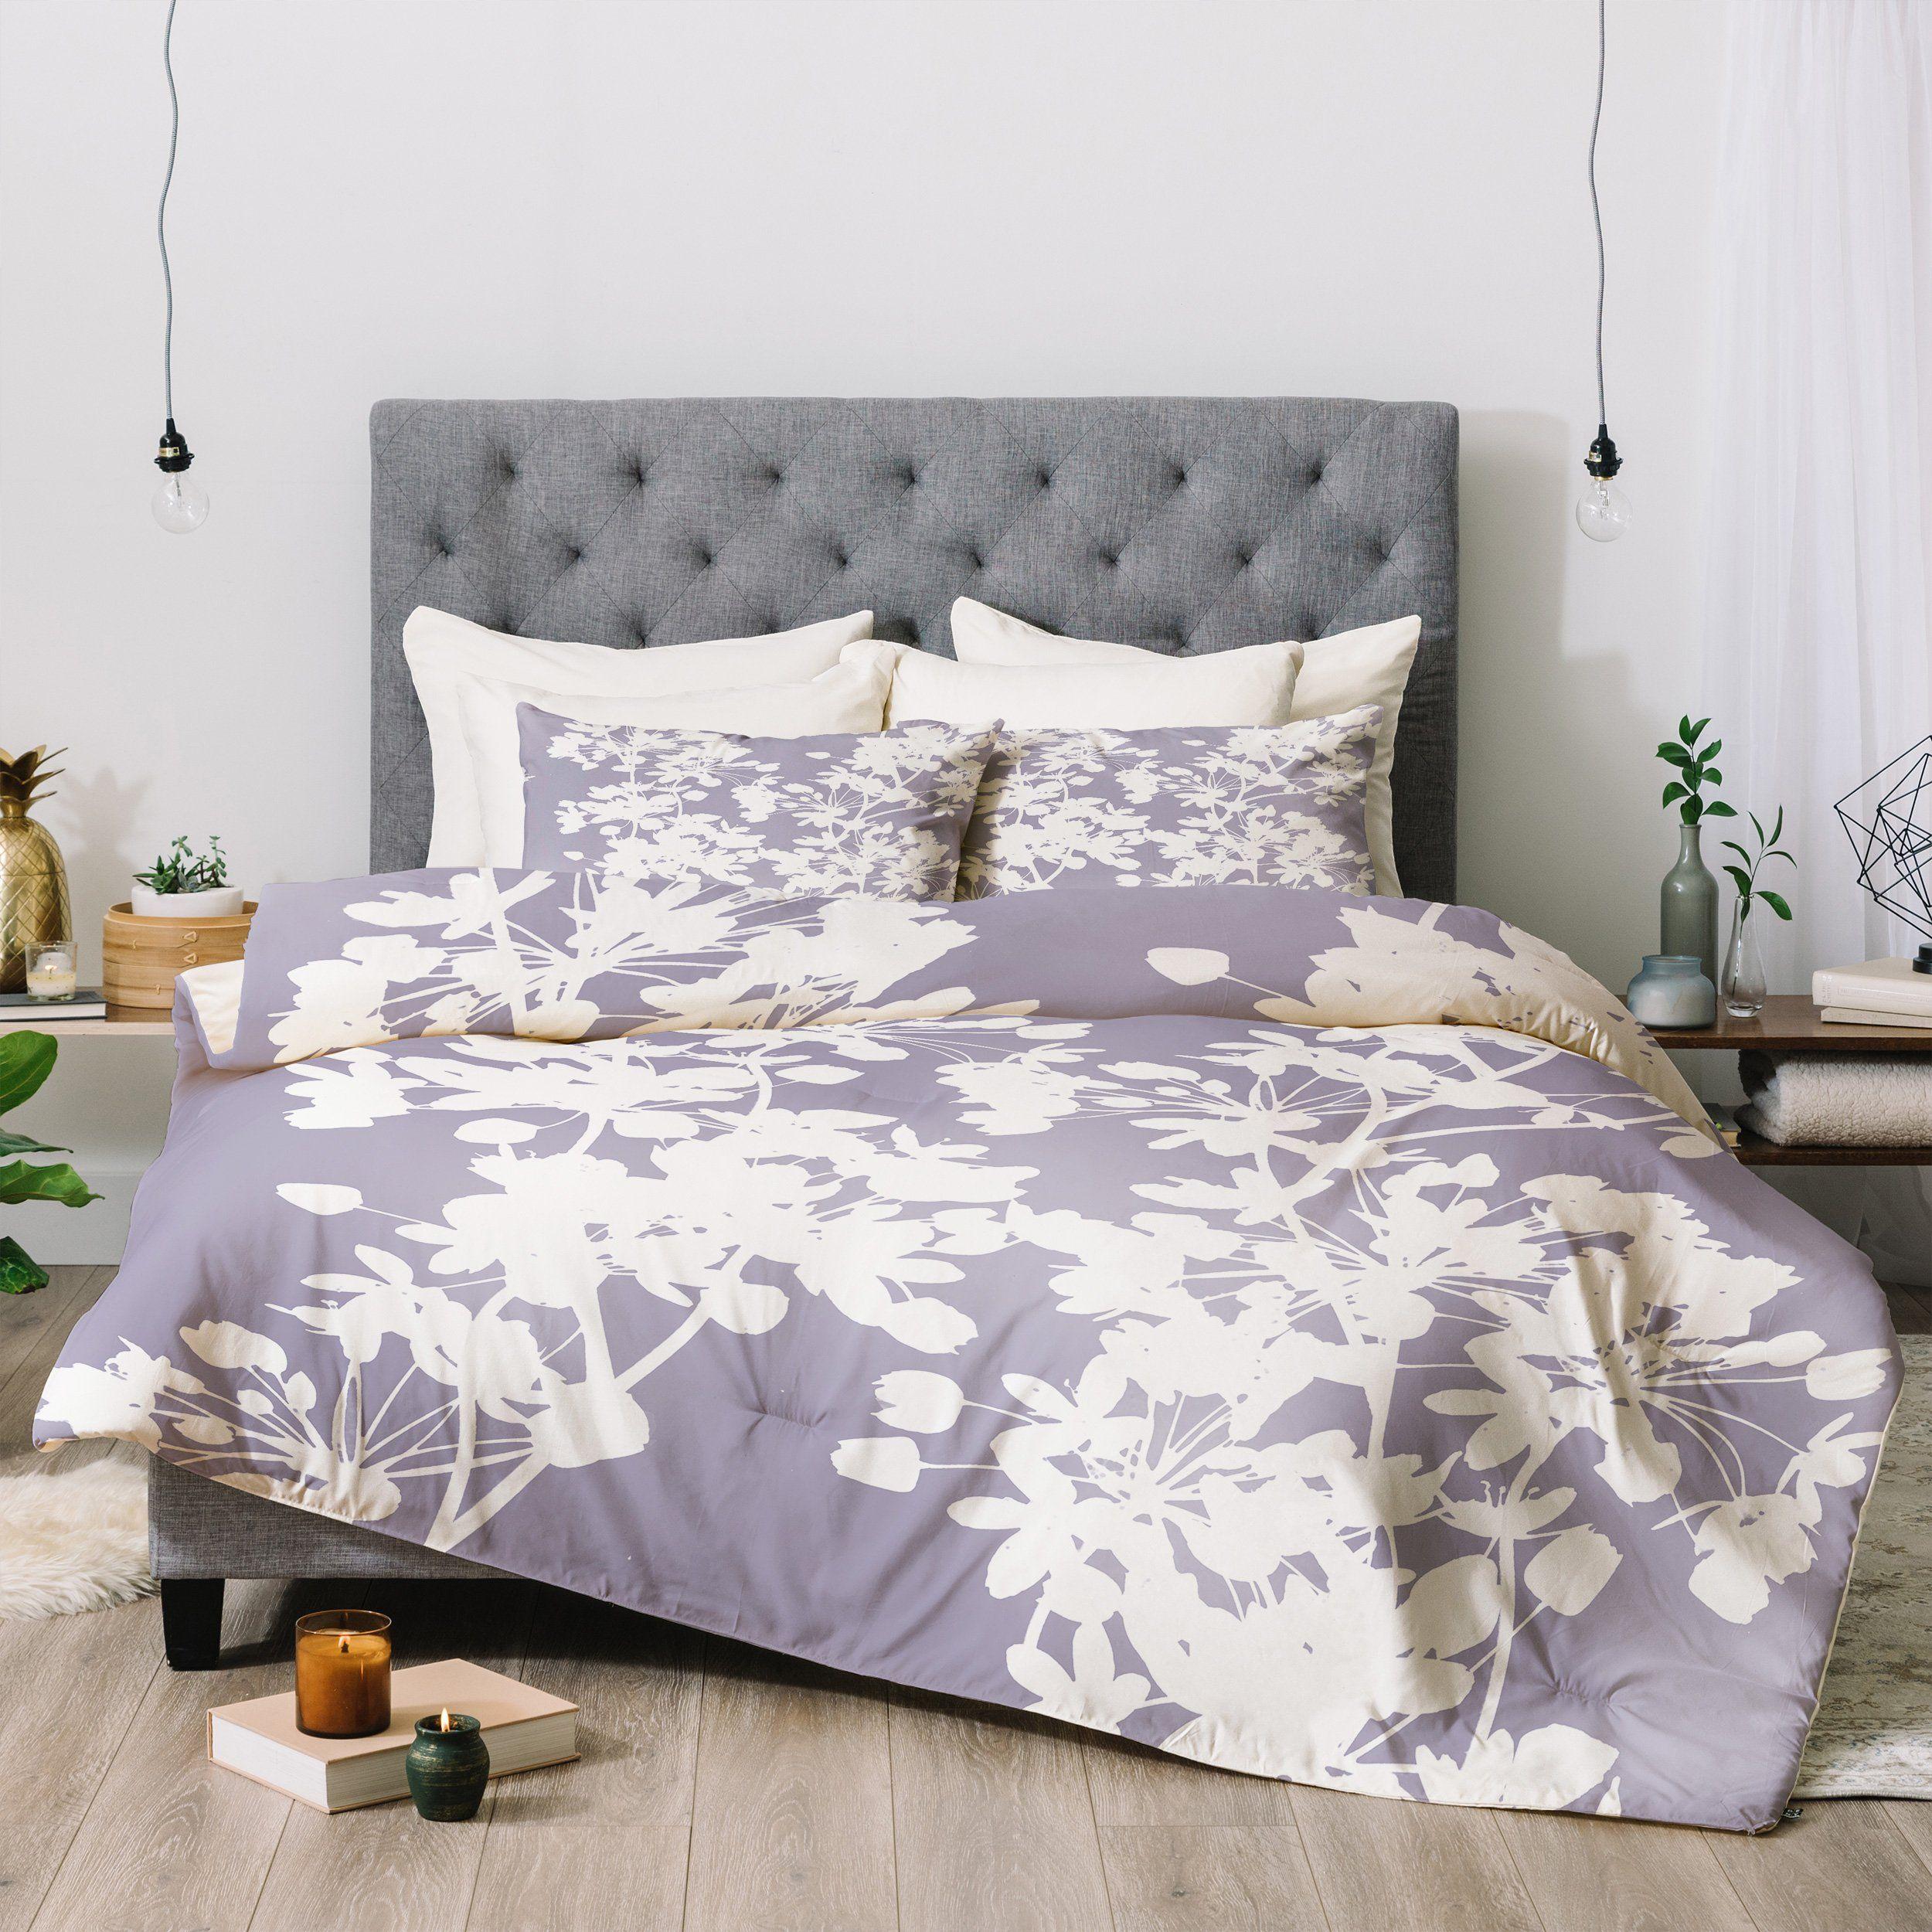 Emanuela Carratoni Delicate Floral Pattern On Lilac Comforter